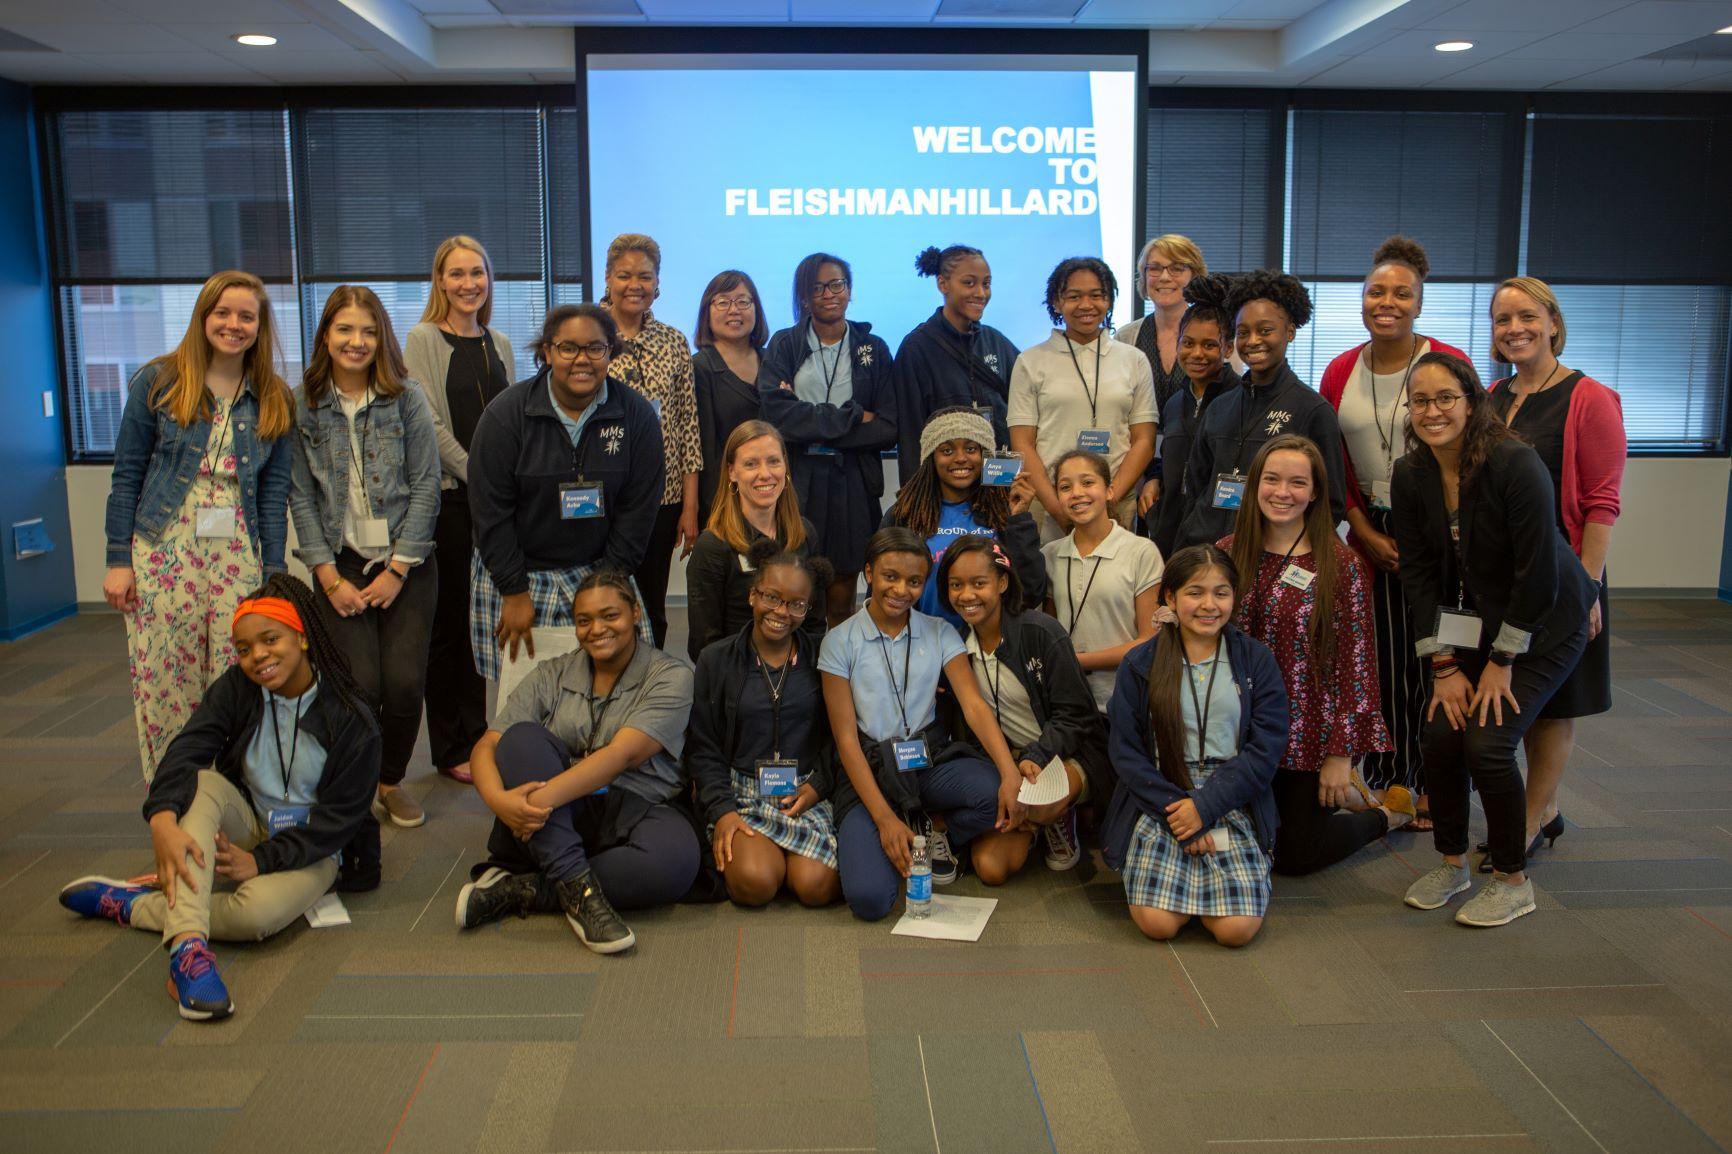 FleishmanHillard FH4Inclusion team with Marian Middle School students.